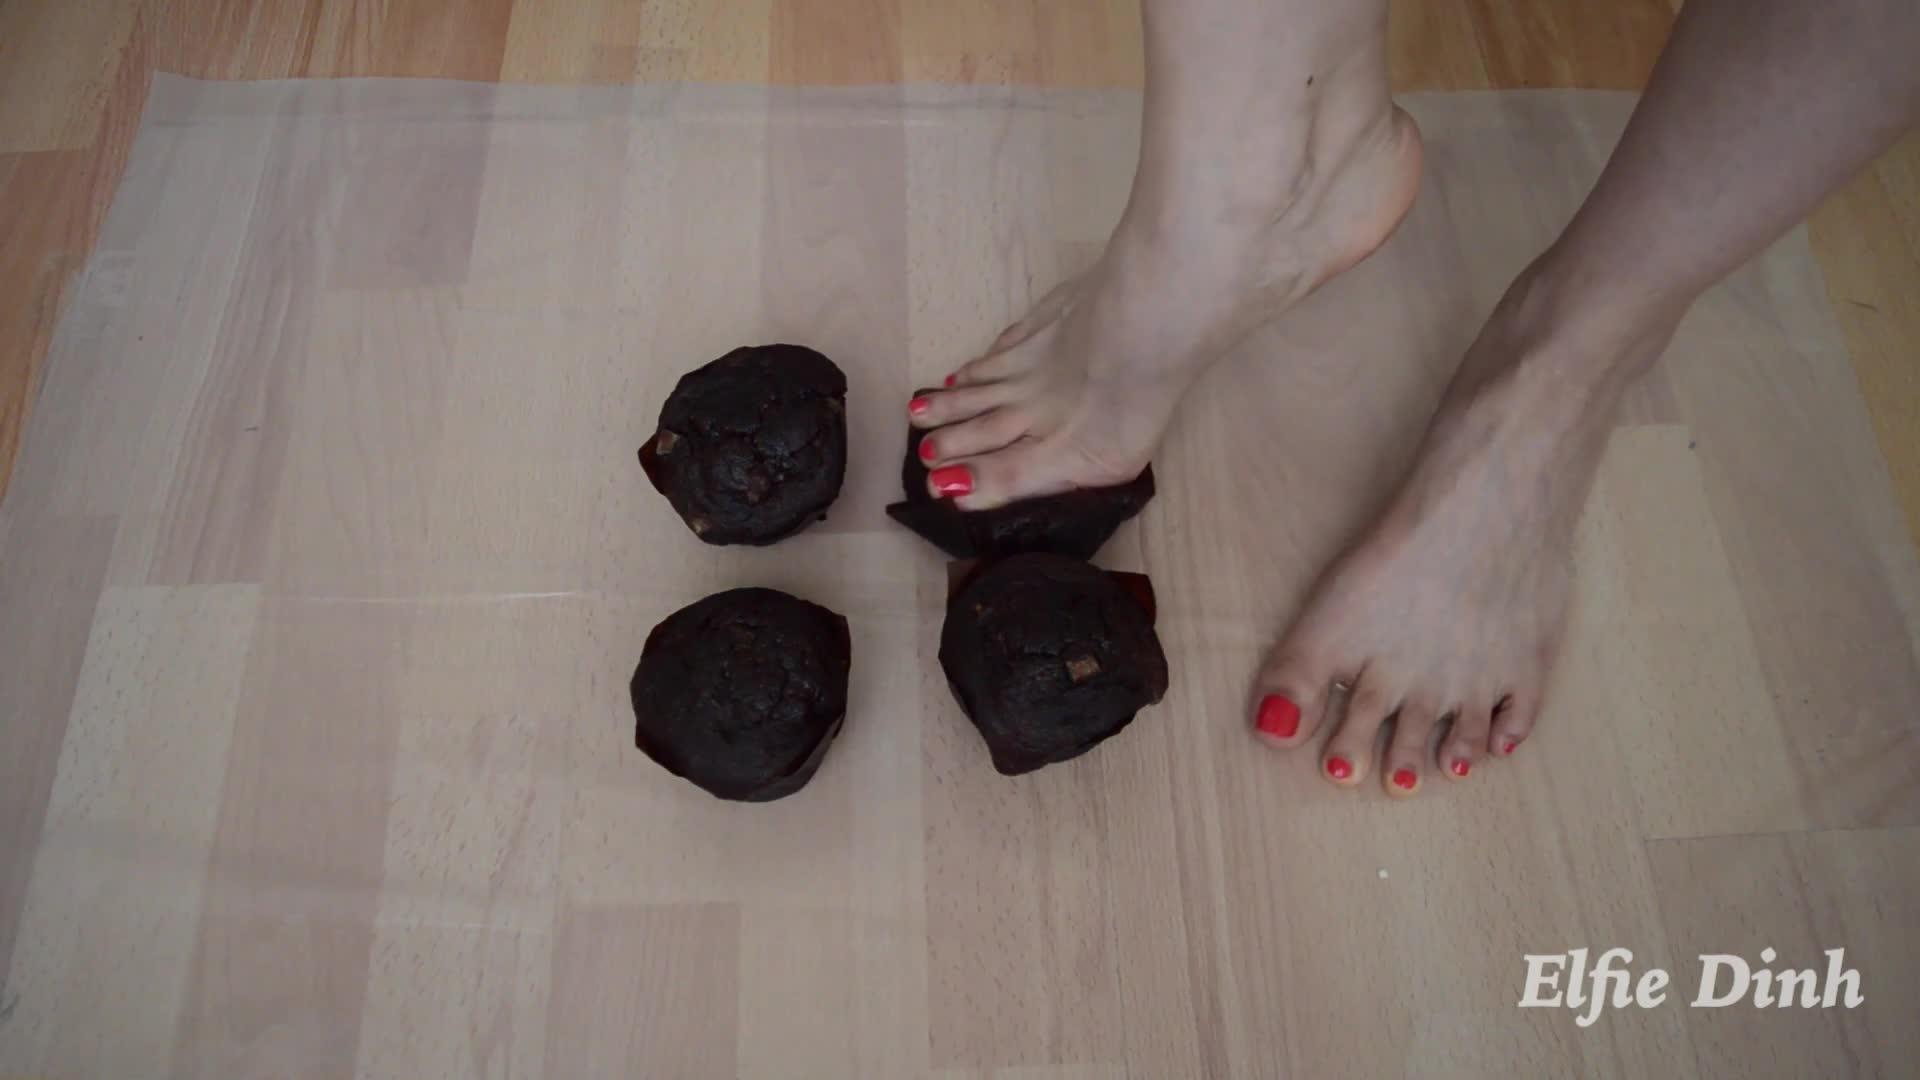 Shaye rivers foot fetish video 7